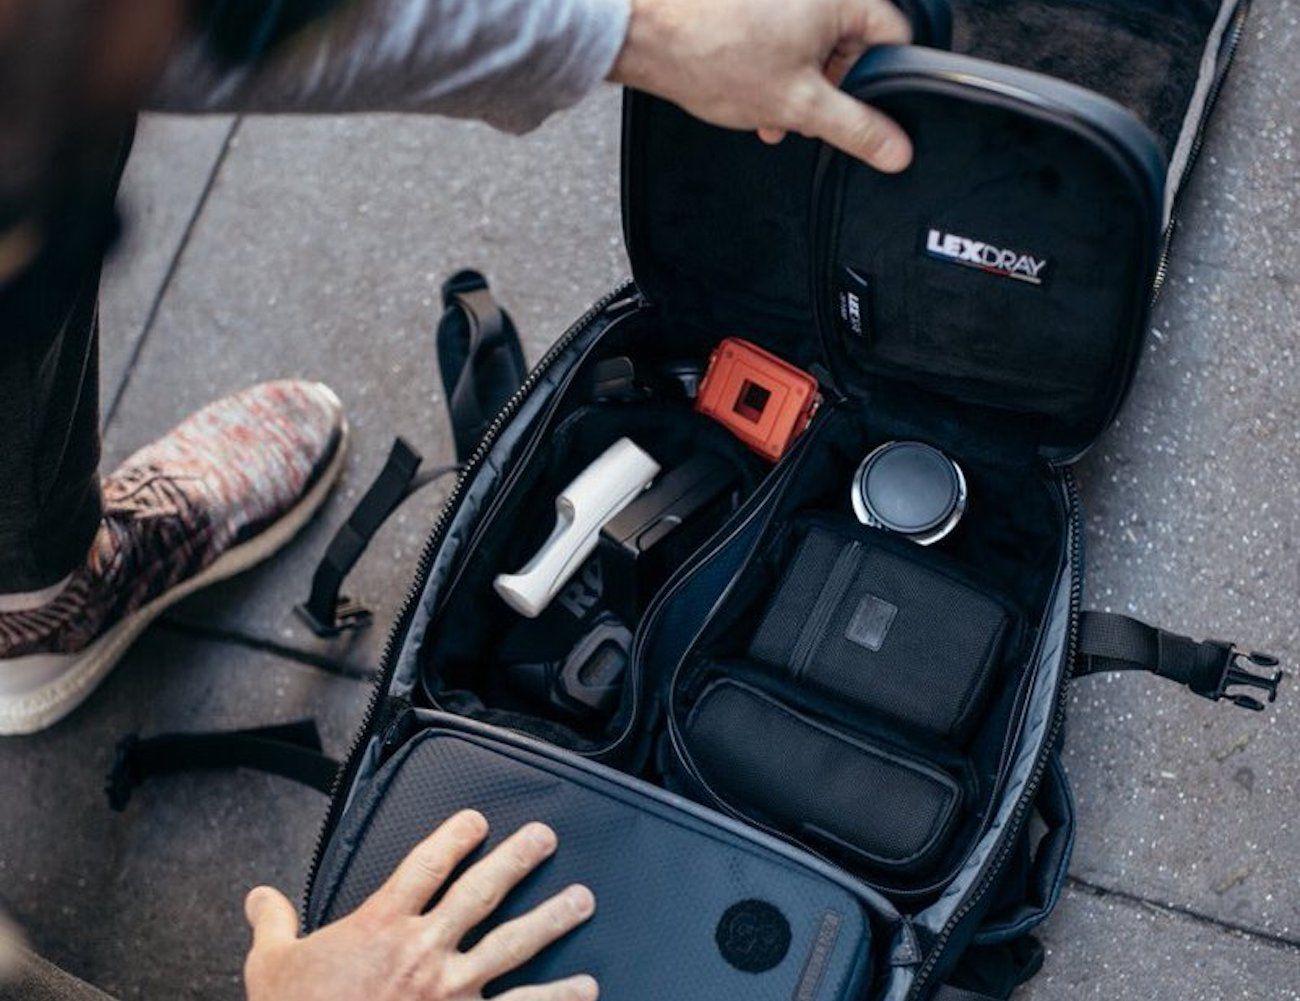 Lexdray San Francisco Camera Pack